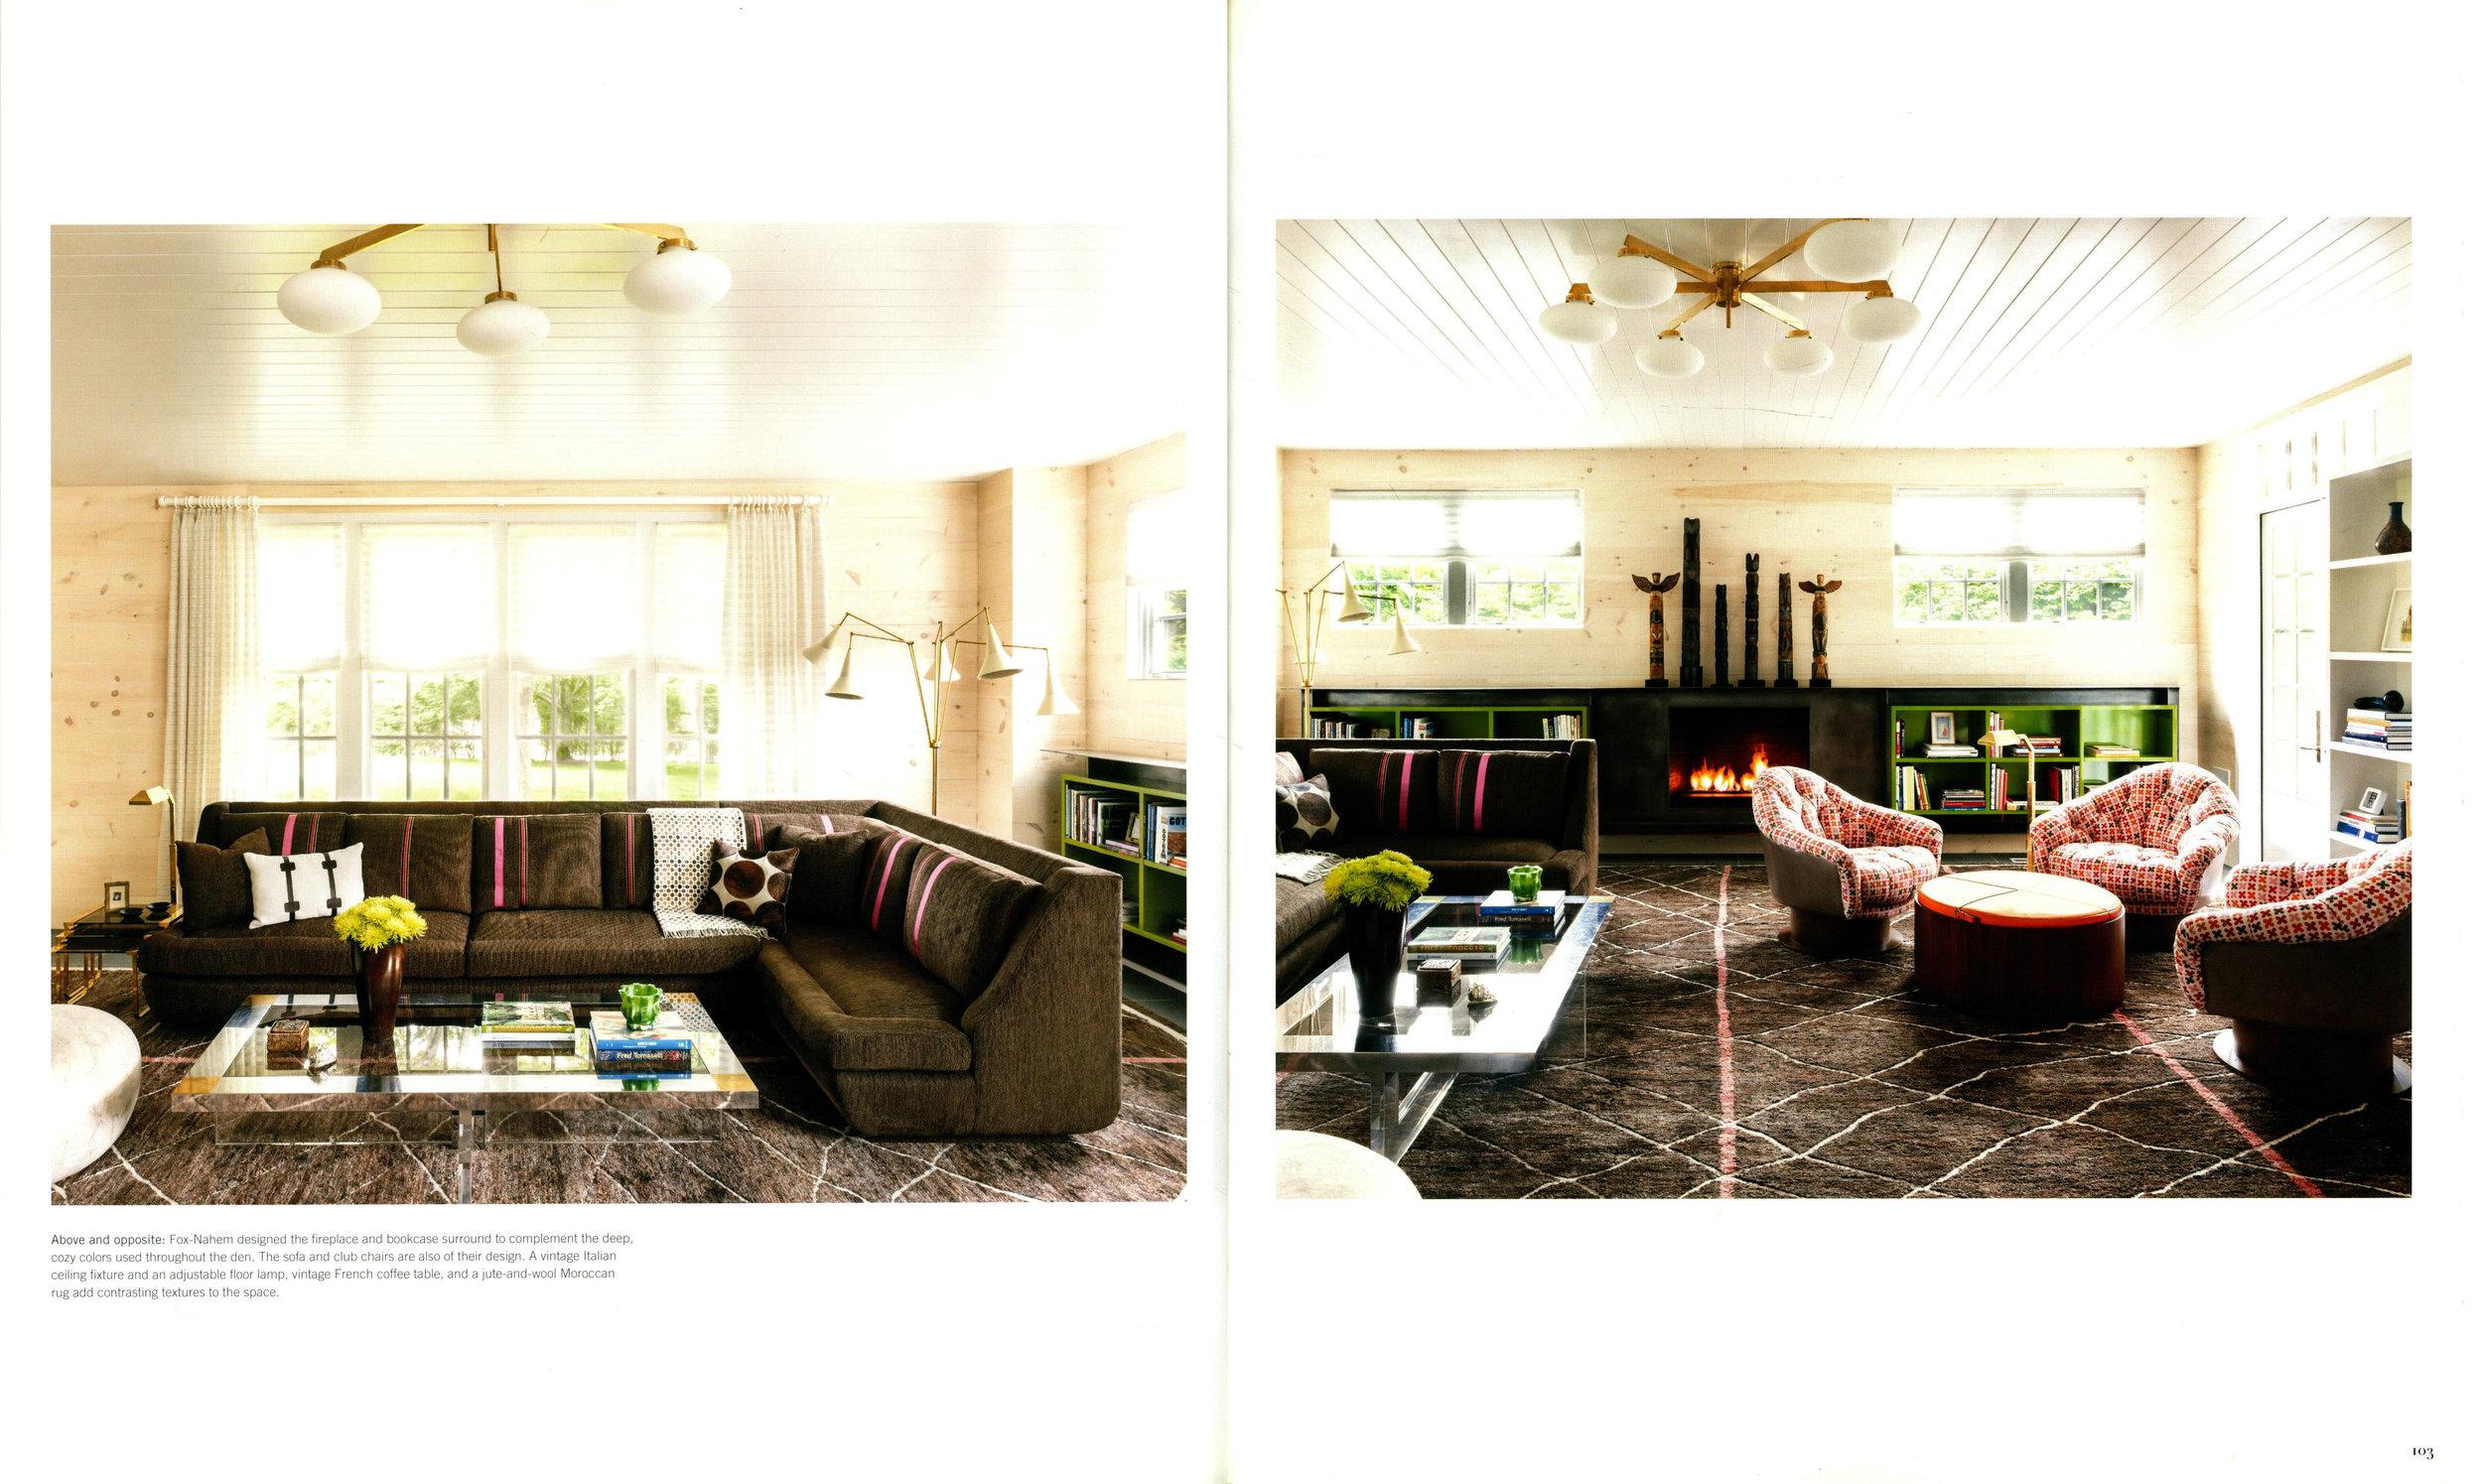 Design in the hamptons spread 5.jpg